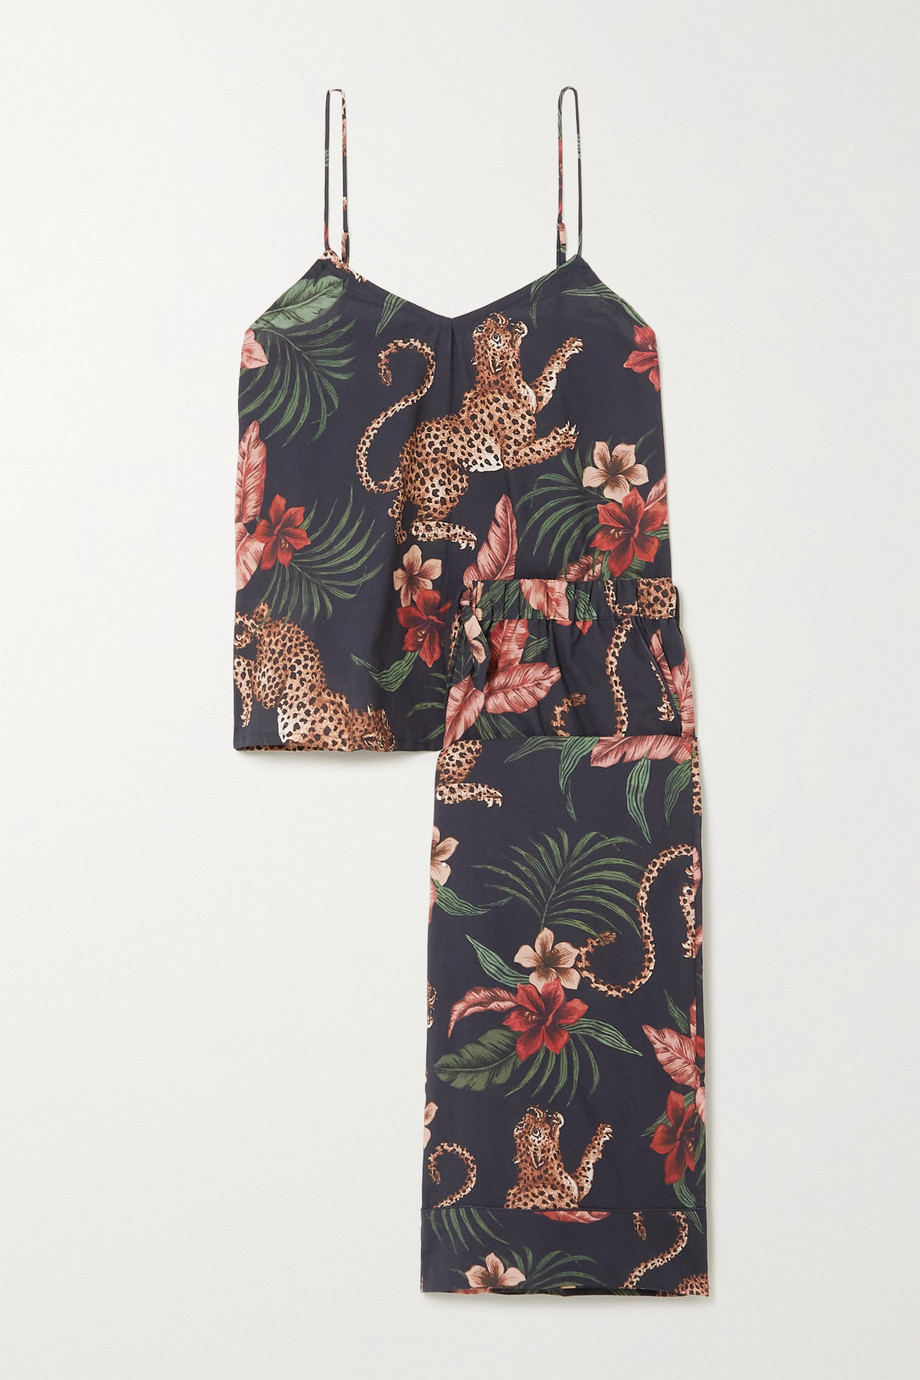 Desmond & Dempsey Soleia printed cotton pajama set